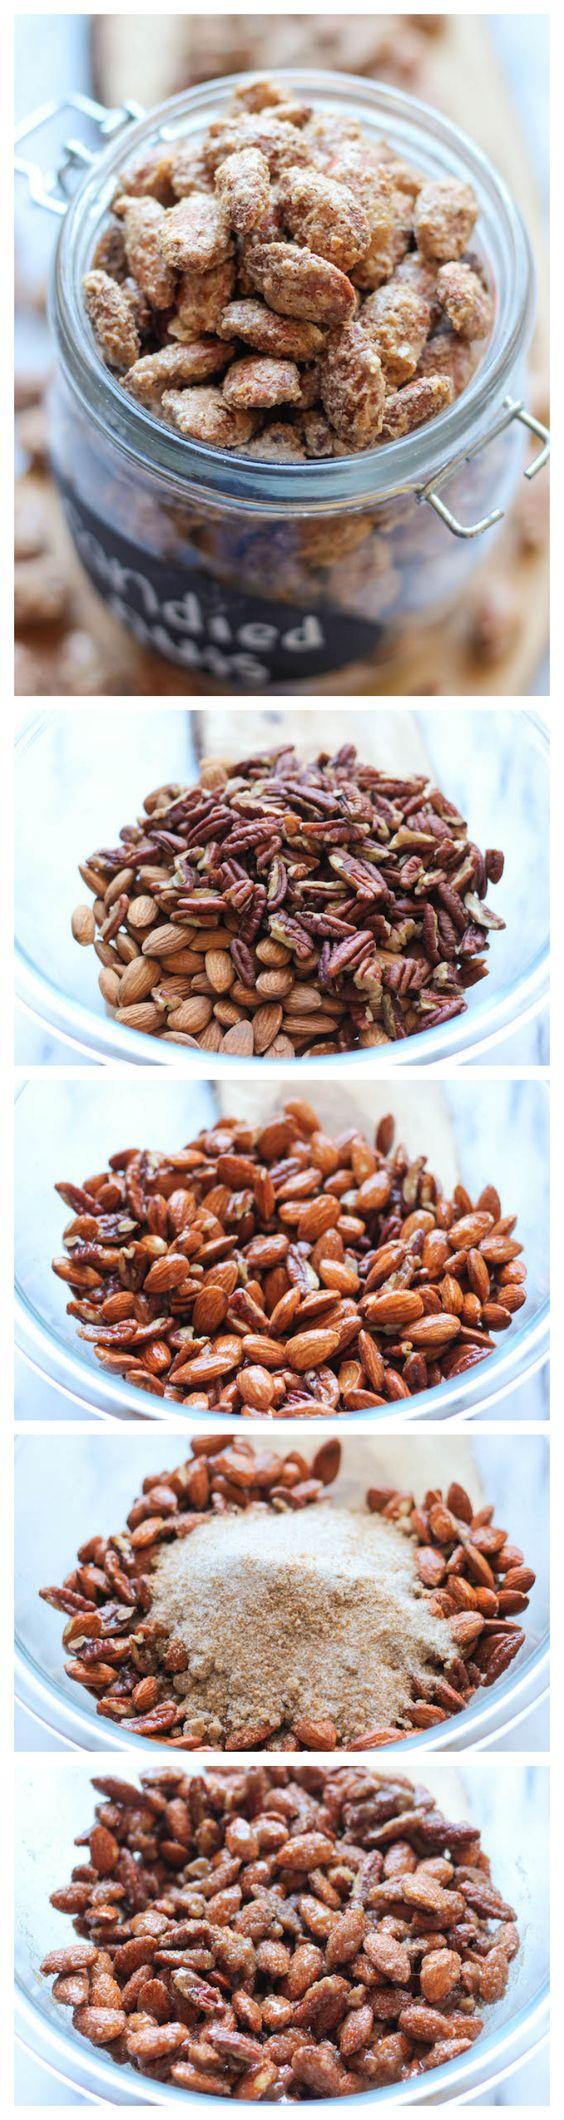 ... Sugar Candied Nuts | Recipe | Candied Nuts, Cinnamon and Sugar